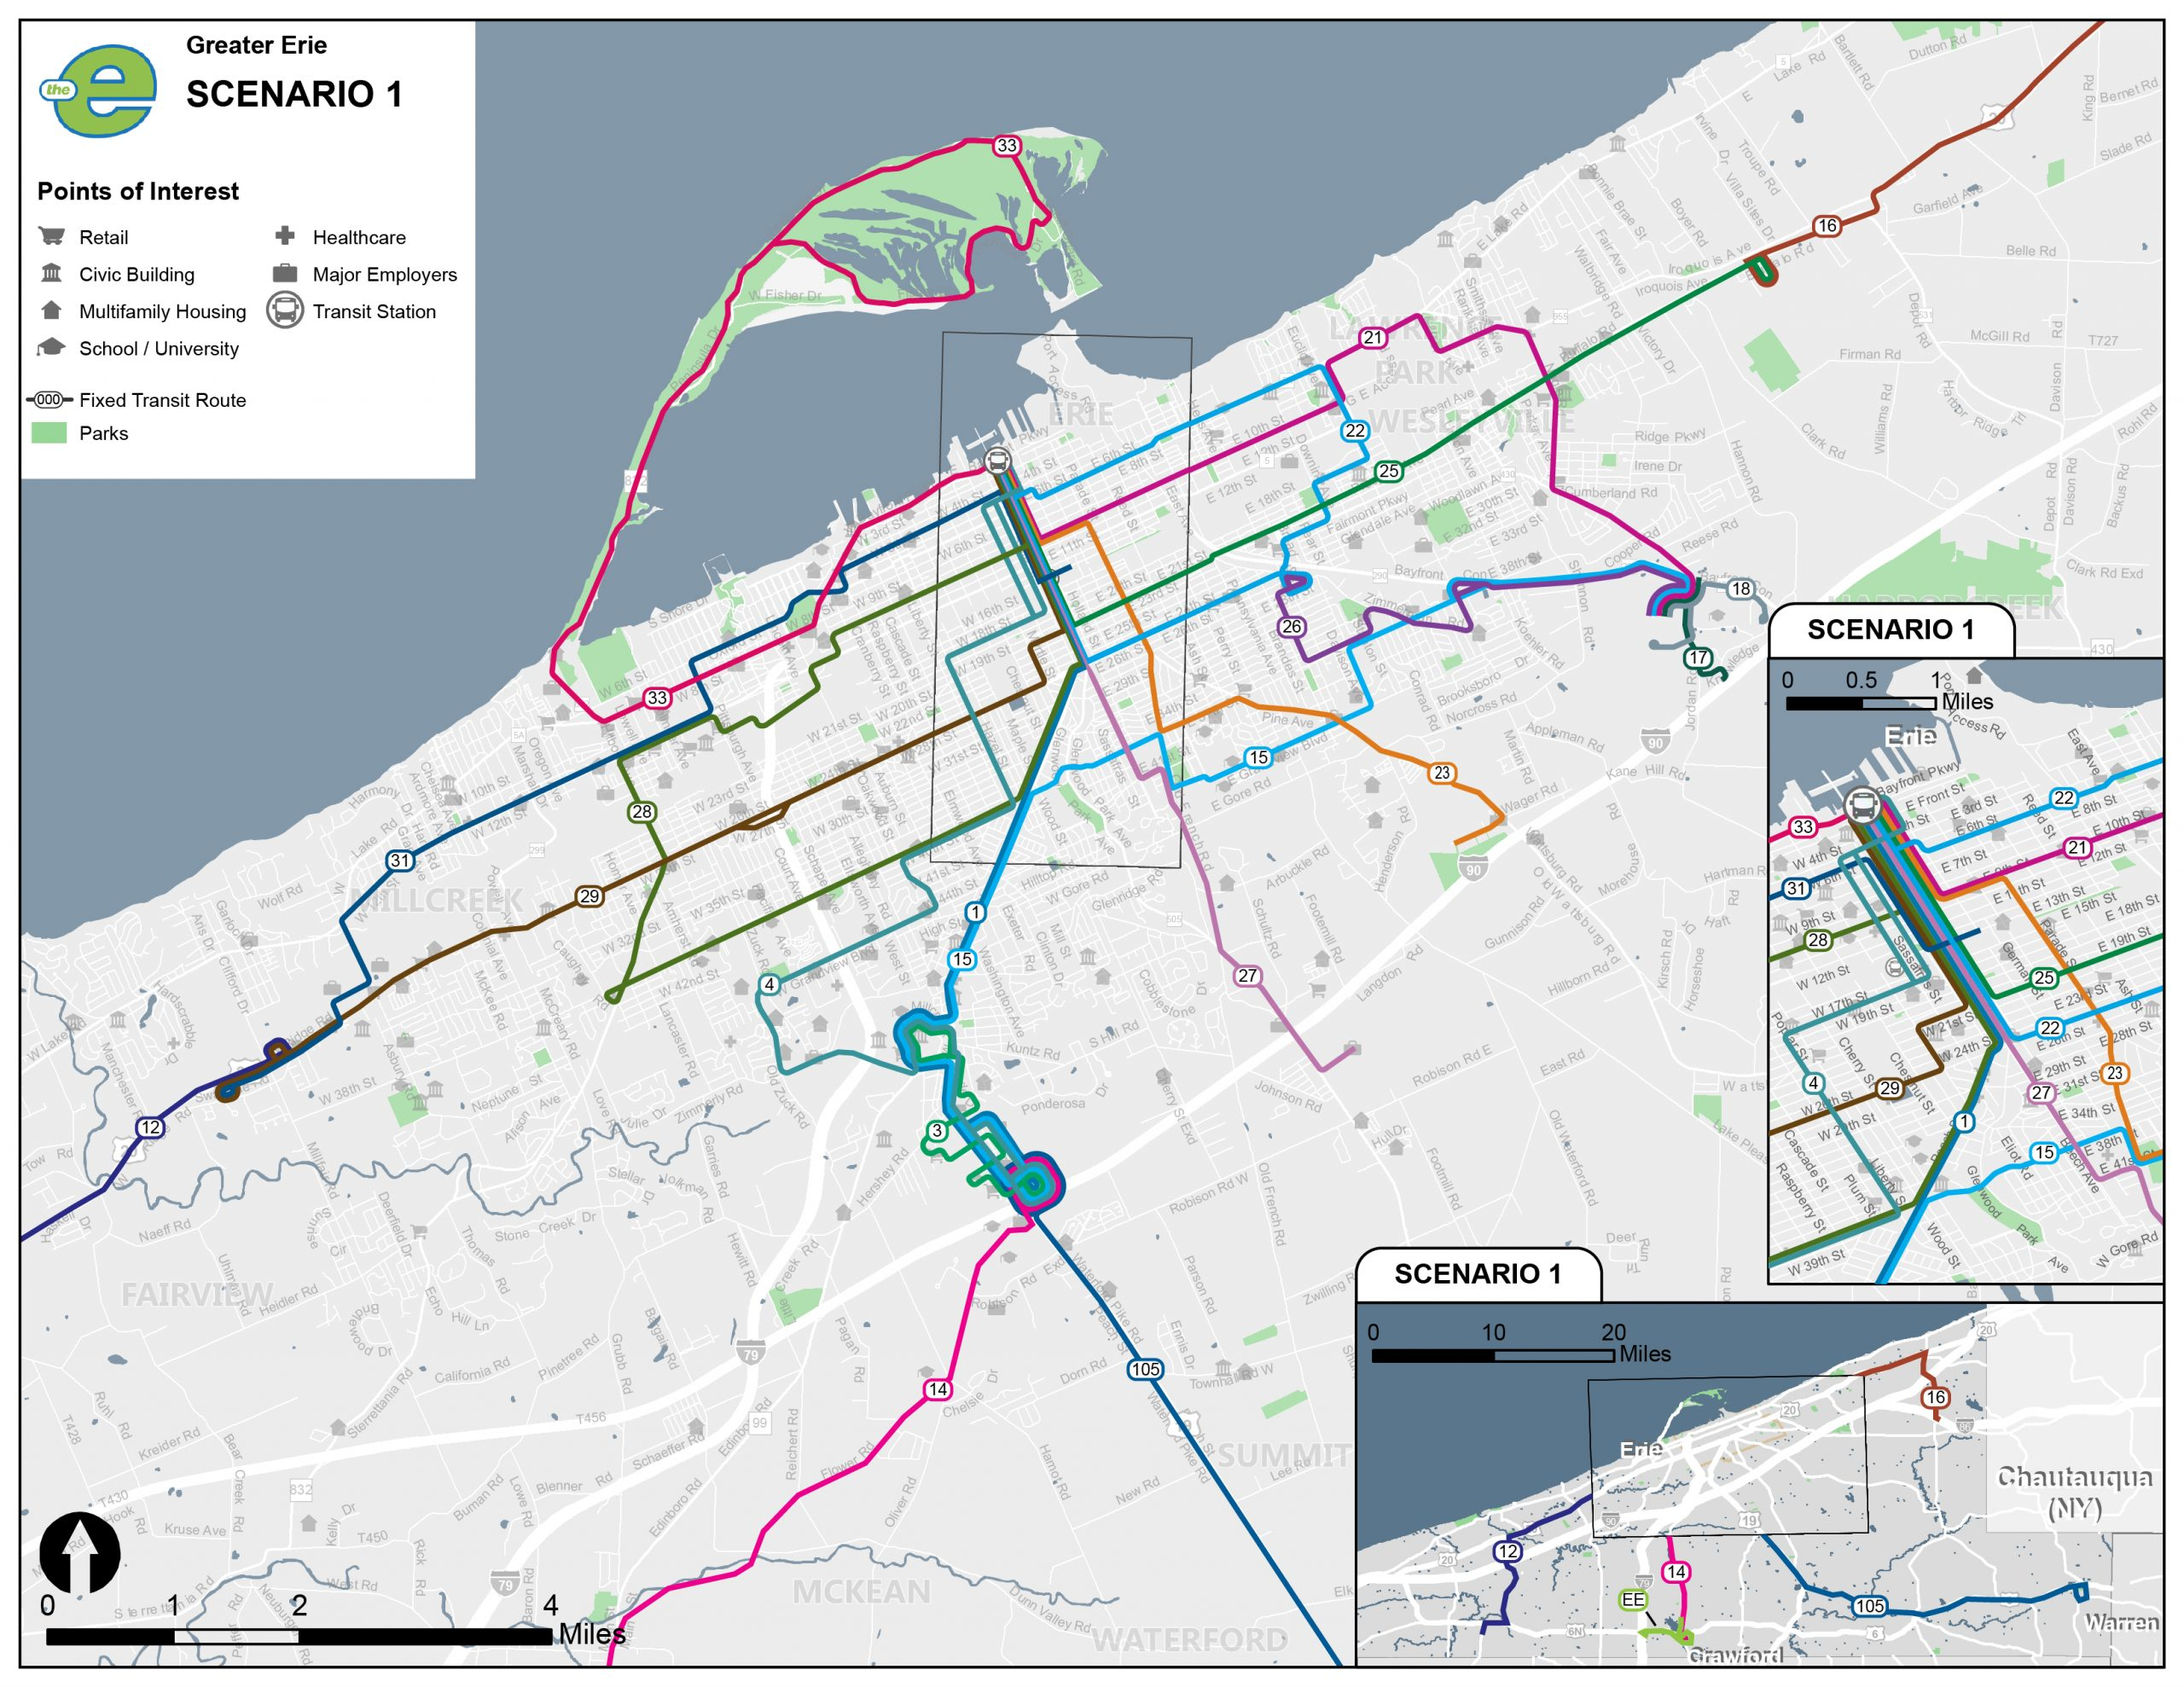 Scenario 1 of the EMTA bus route.